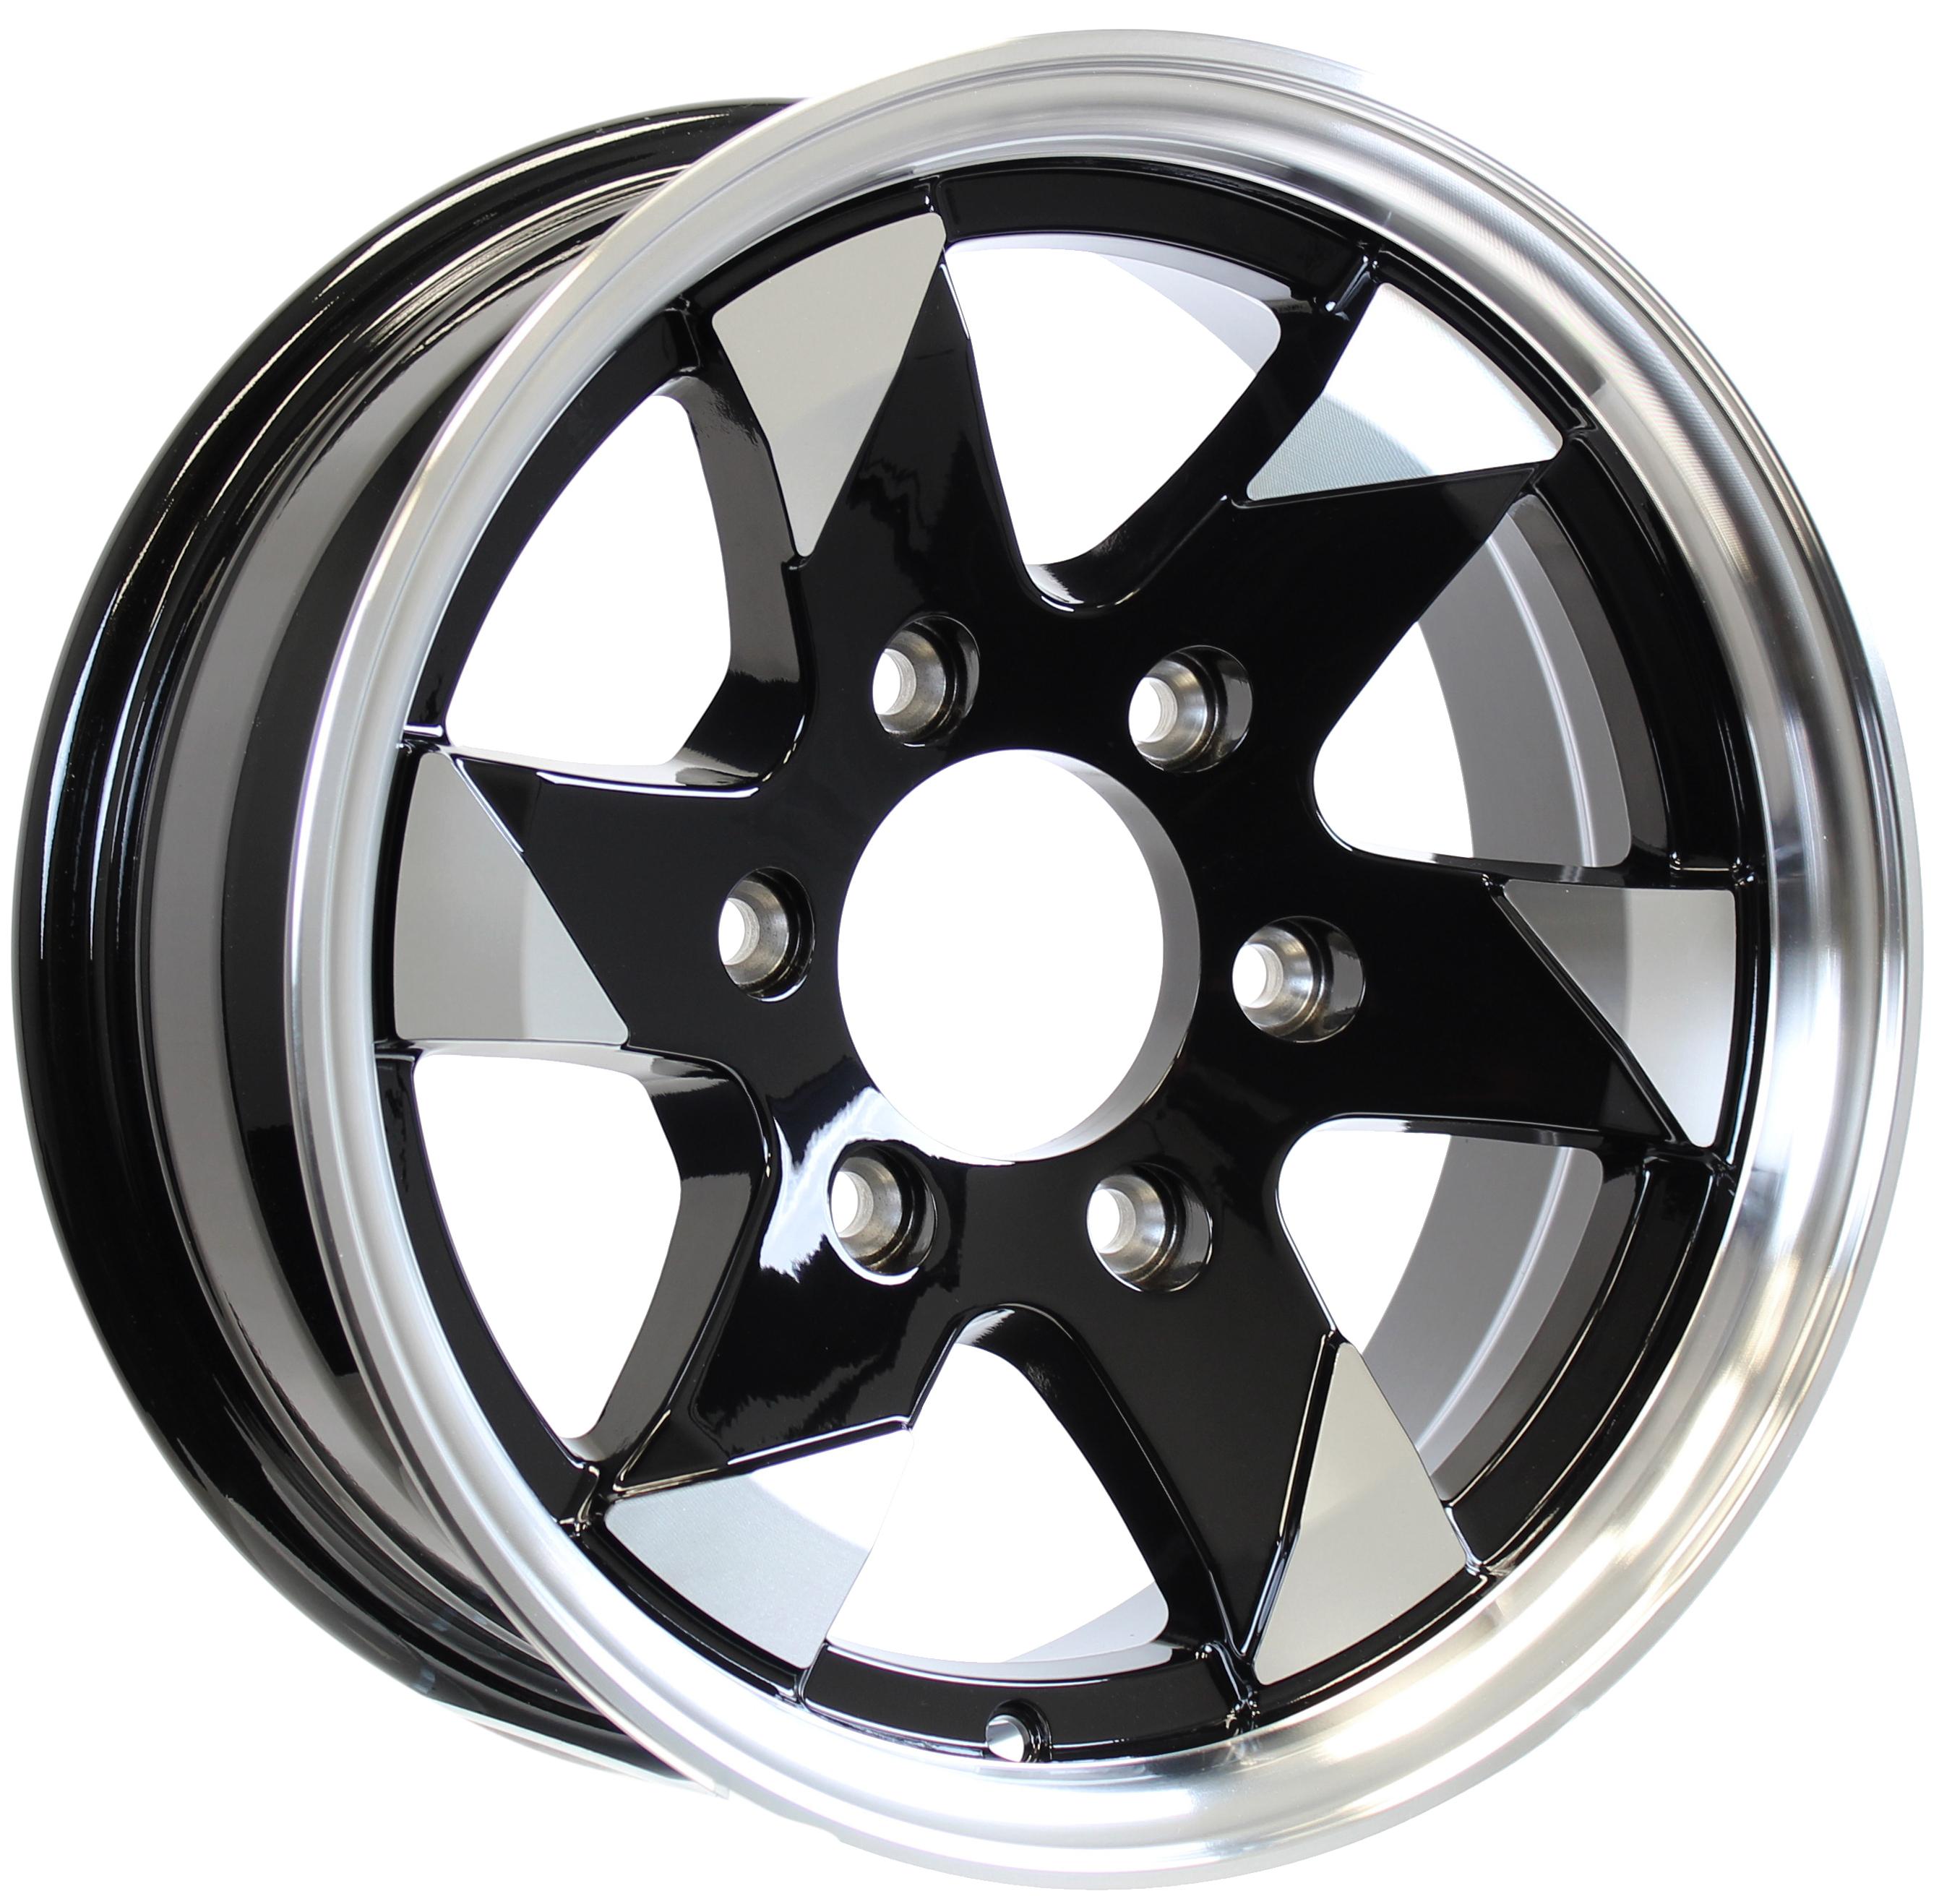 Ascent- 15x6 6-5.5 Black Aluminum Trailer Wheel Image